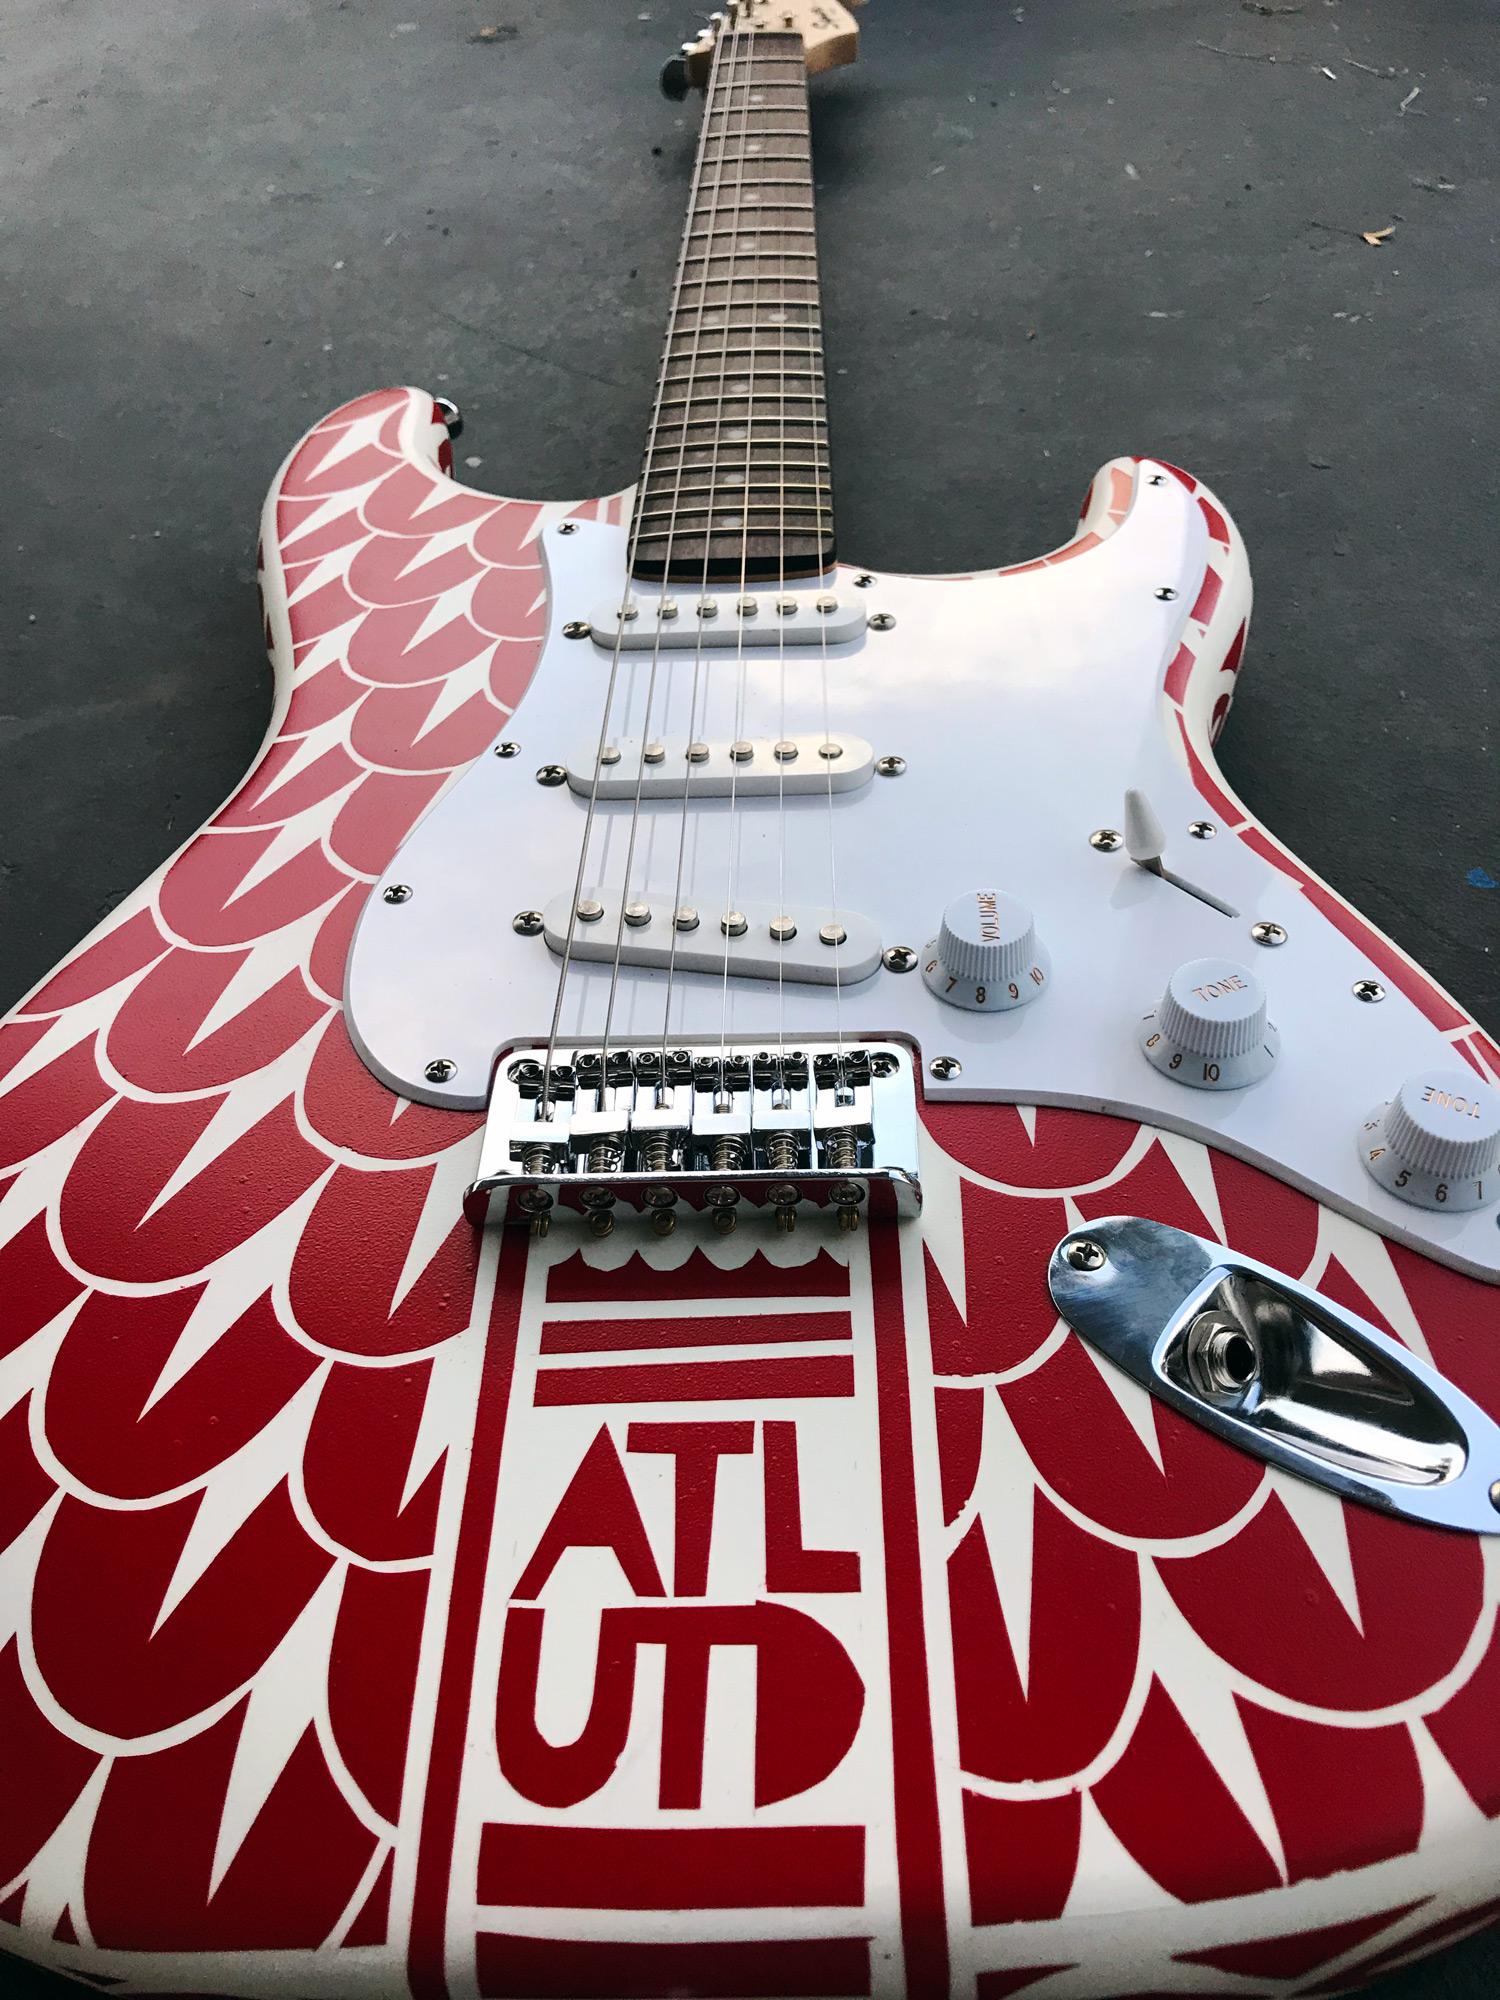 ATLUTD-Guitar1.jpg